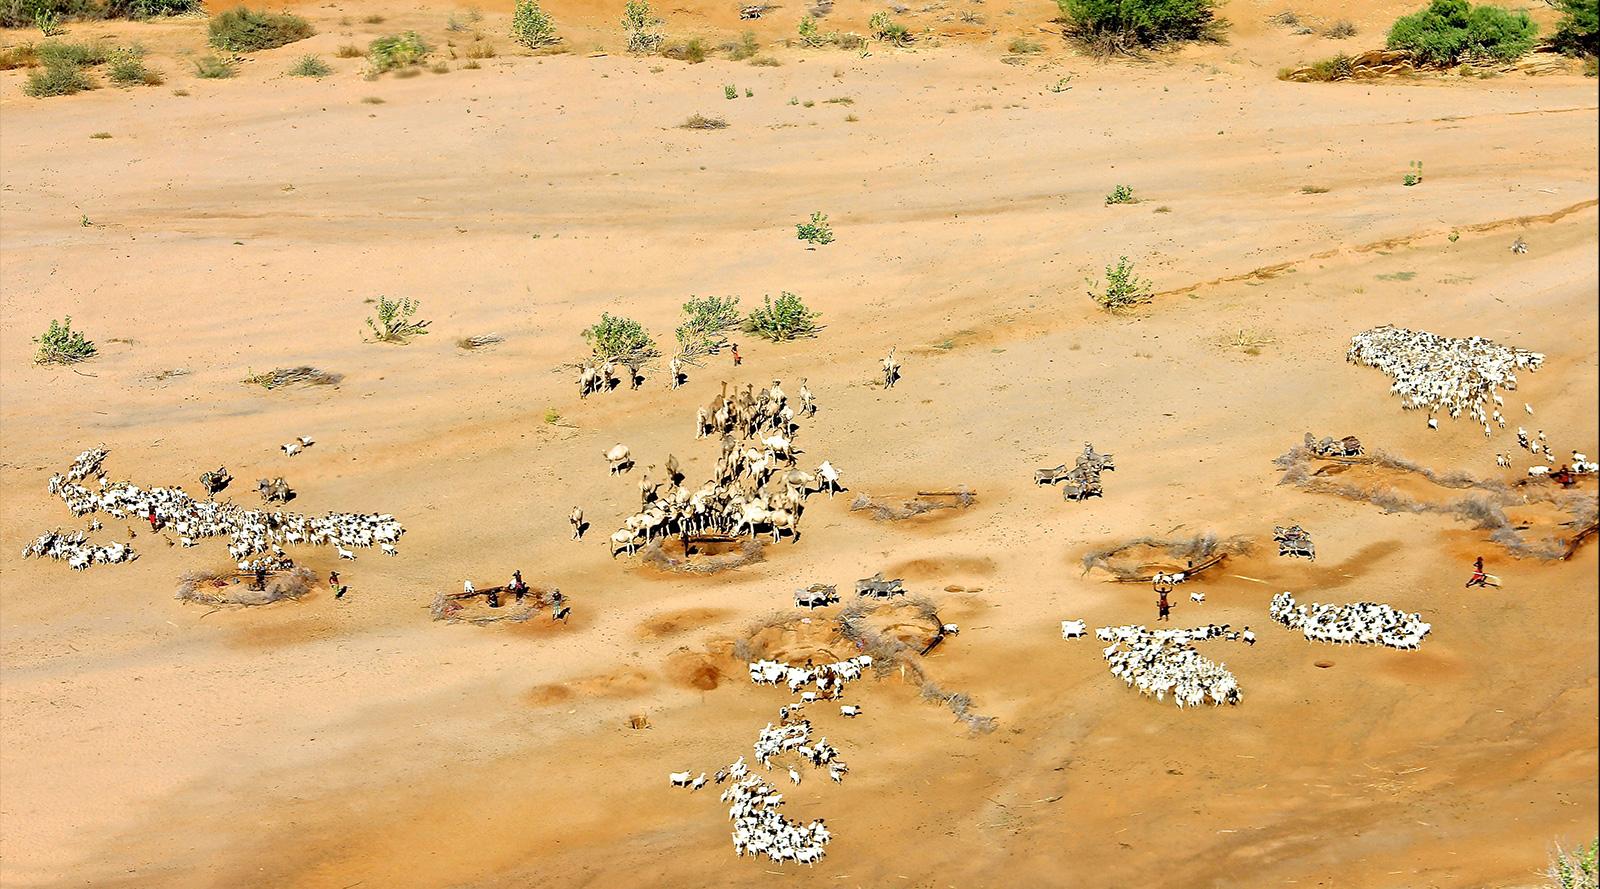 © Benedetta Mazzini | Melako,Kenya